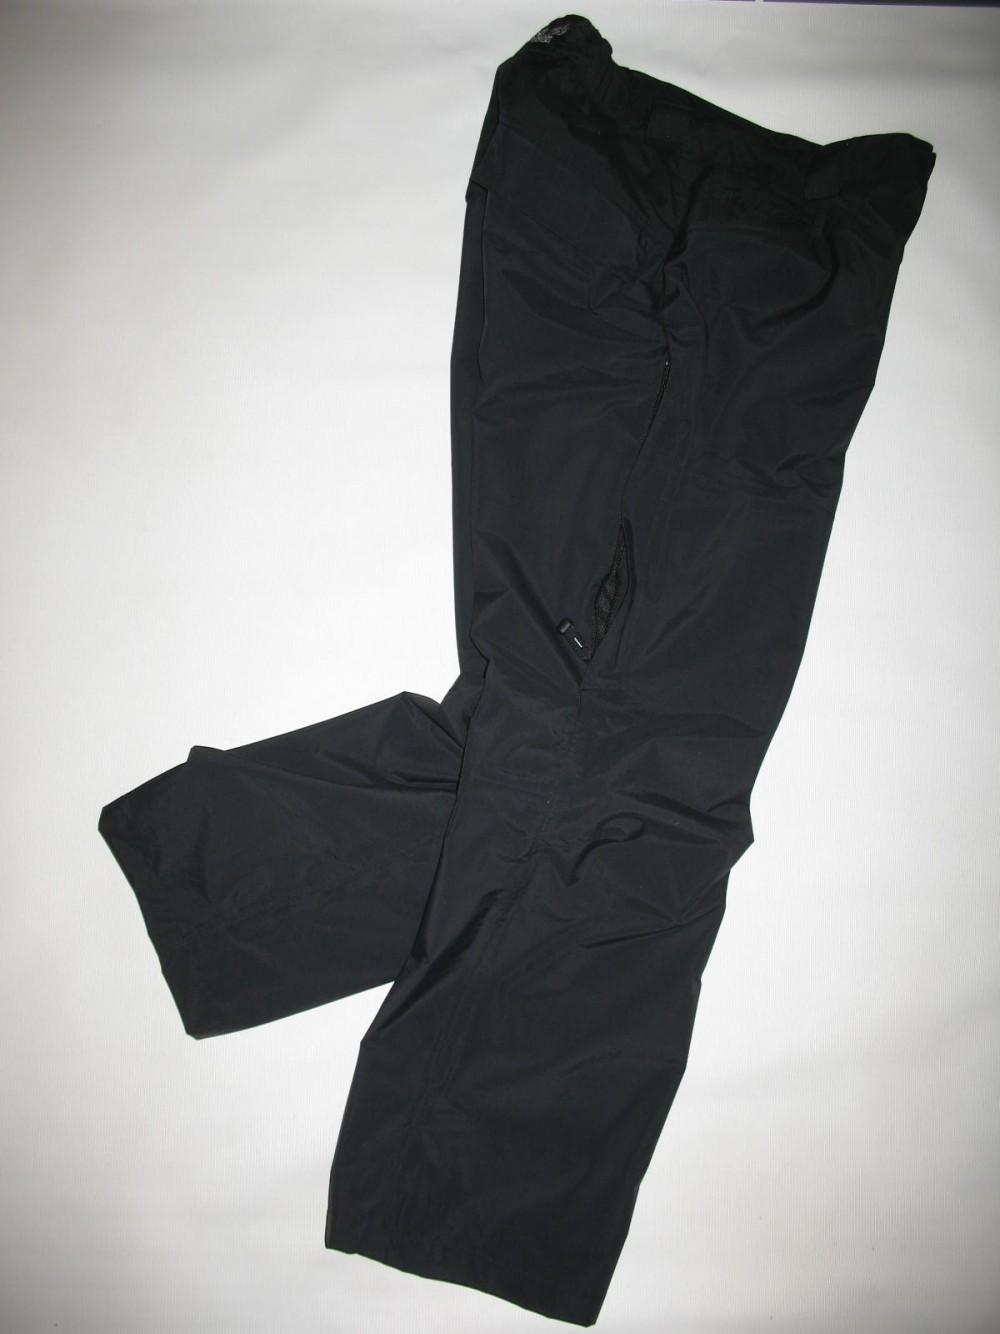 Штаны JACK WOLFSKIN texapore pants (размер M) - 5